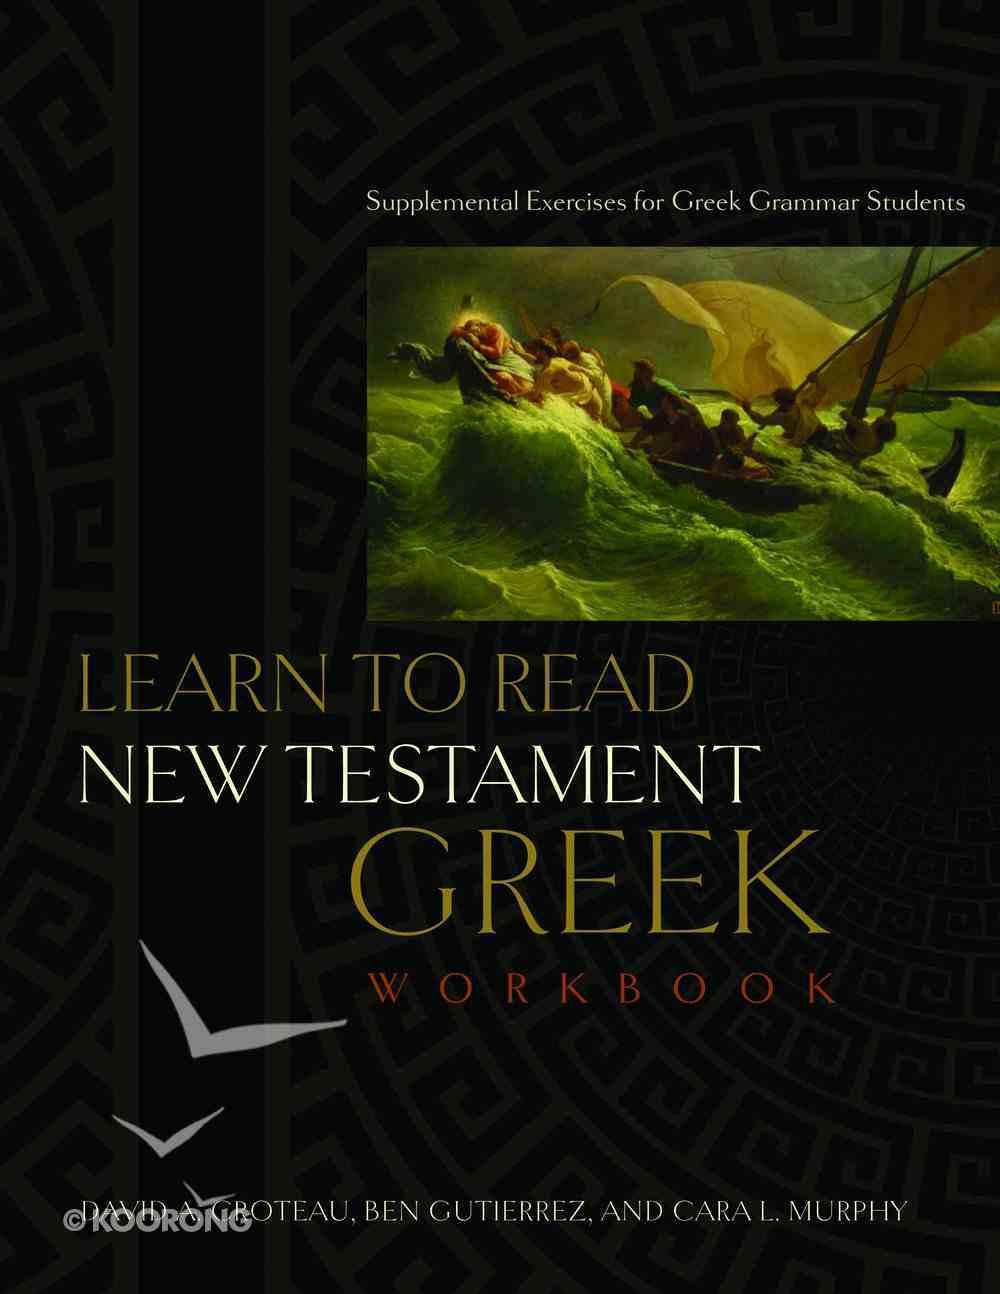 Learn to Read New Testament Greek Workbook Paperback